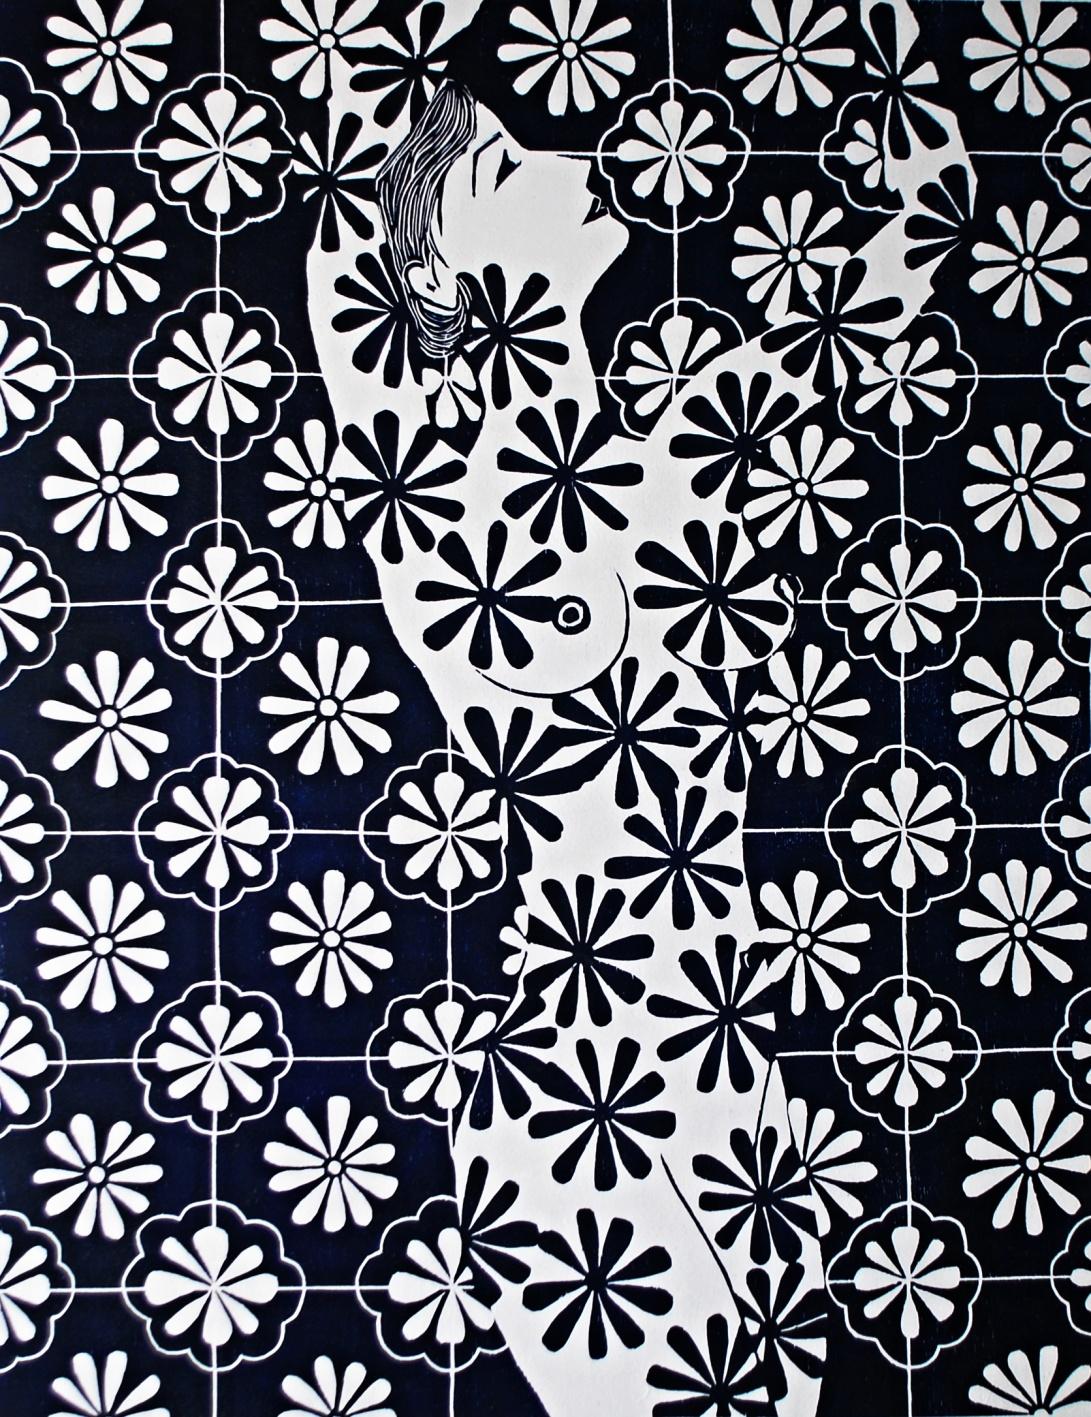 genevieve guadalupe talaveras woodcut 89x69cm 2016